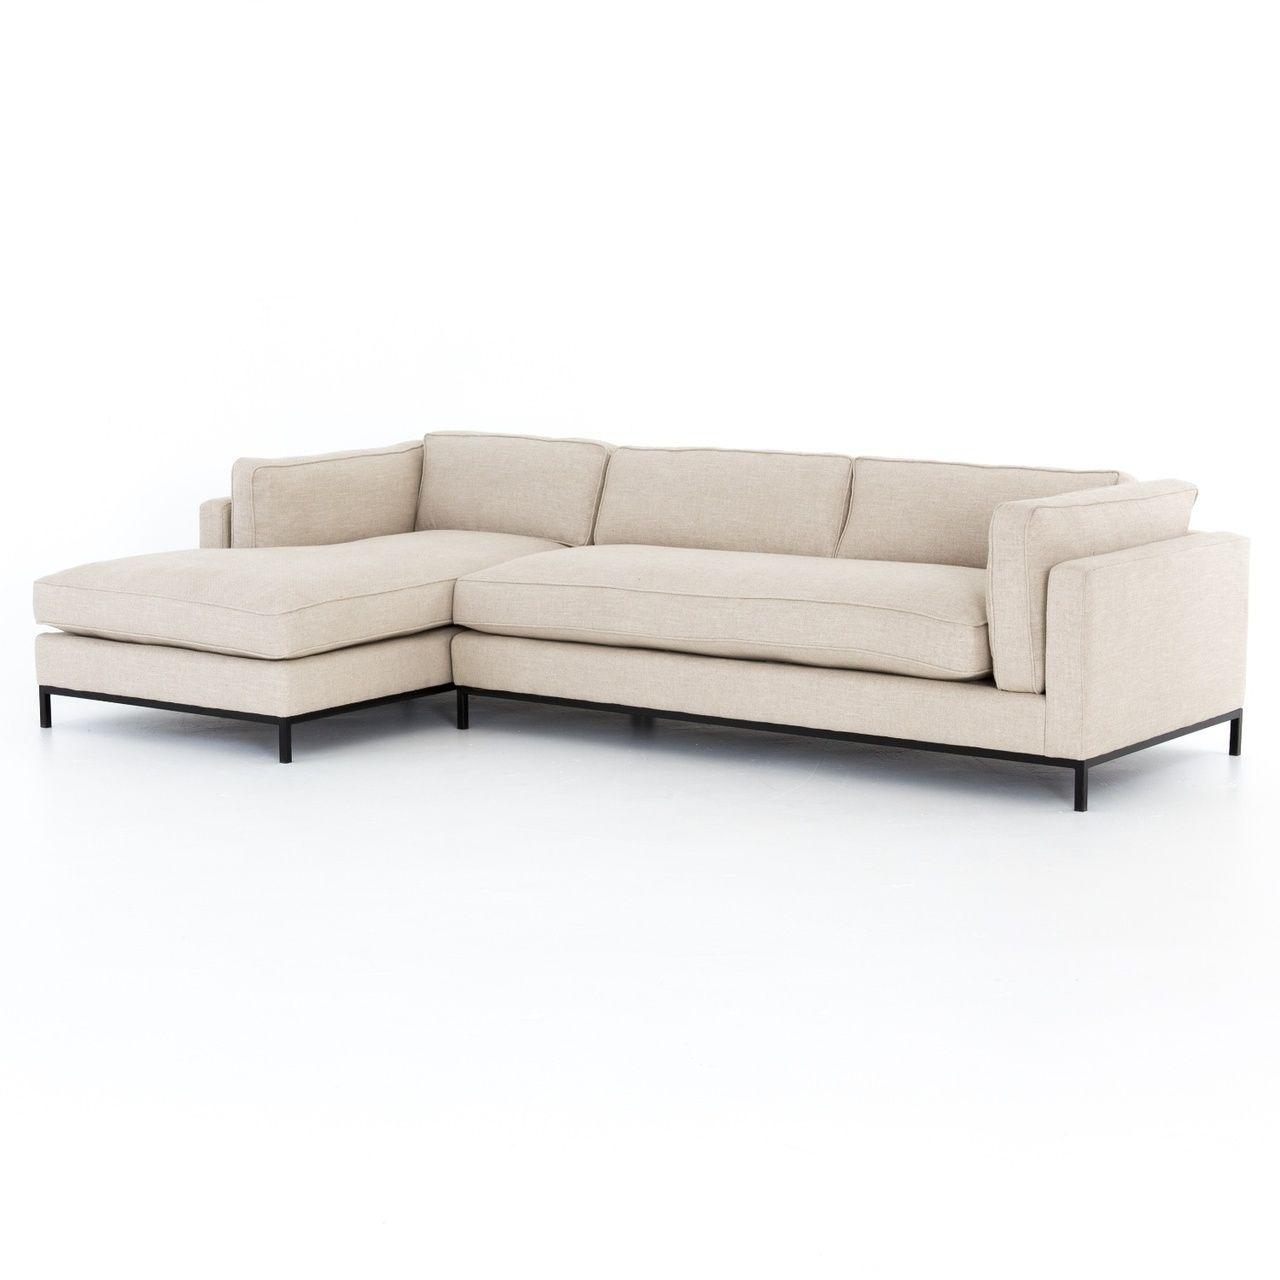 Grammercy Modern Sand Fabric 2 Piece Sectional Sofa 2 Piece